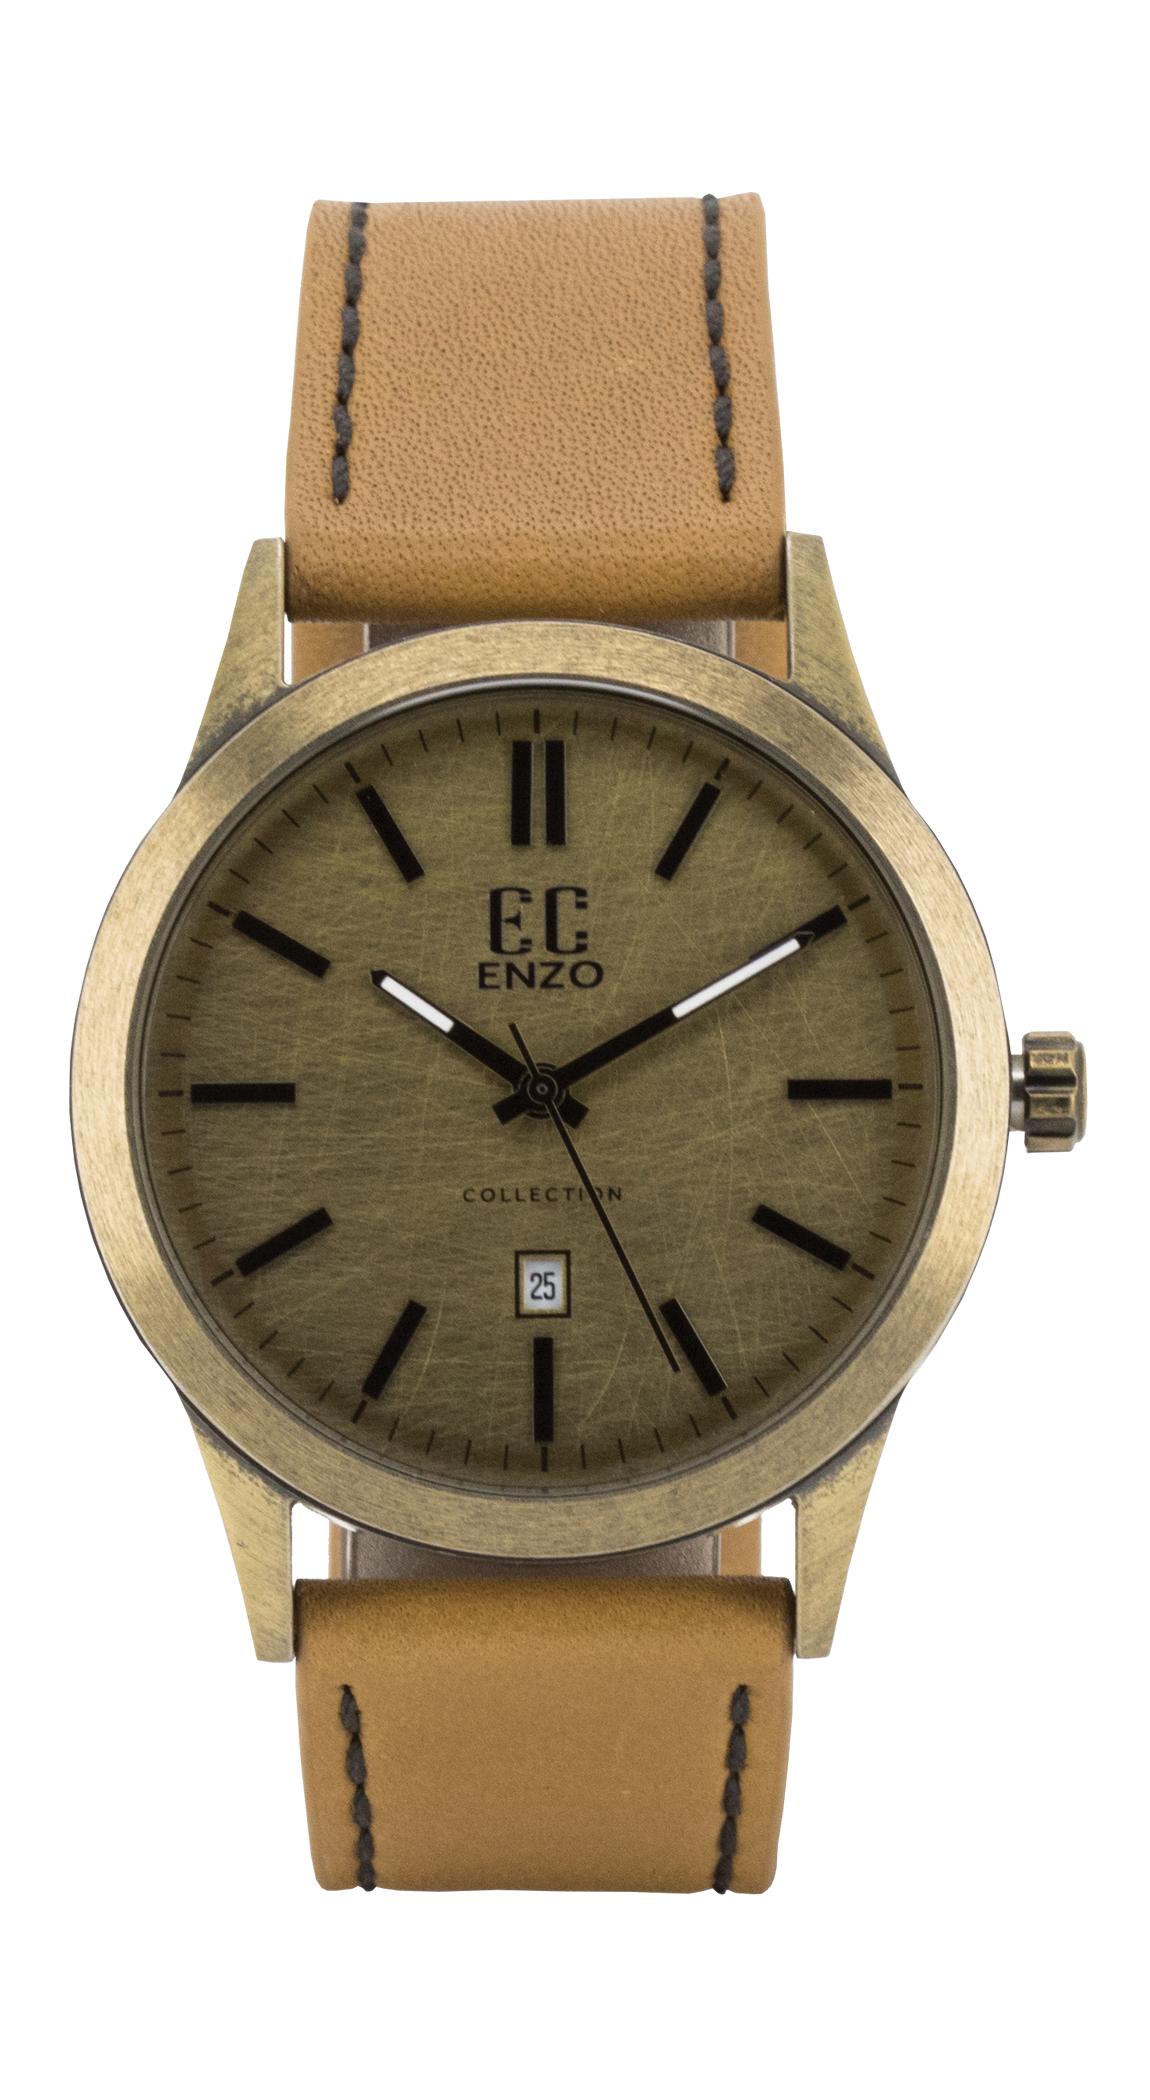 EC#1041# – Enzo Collection